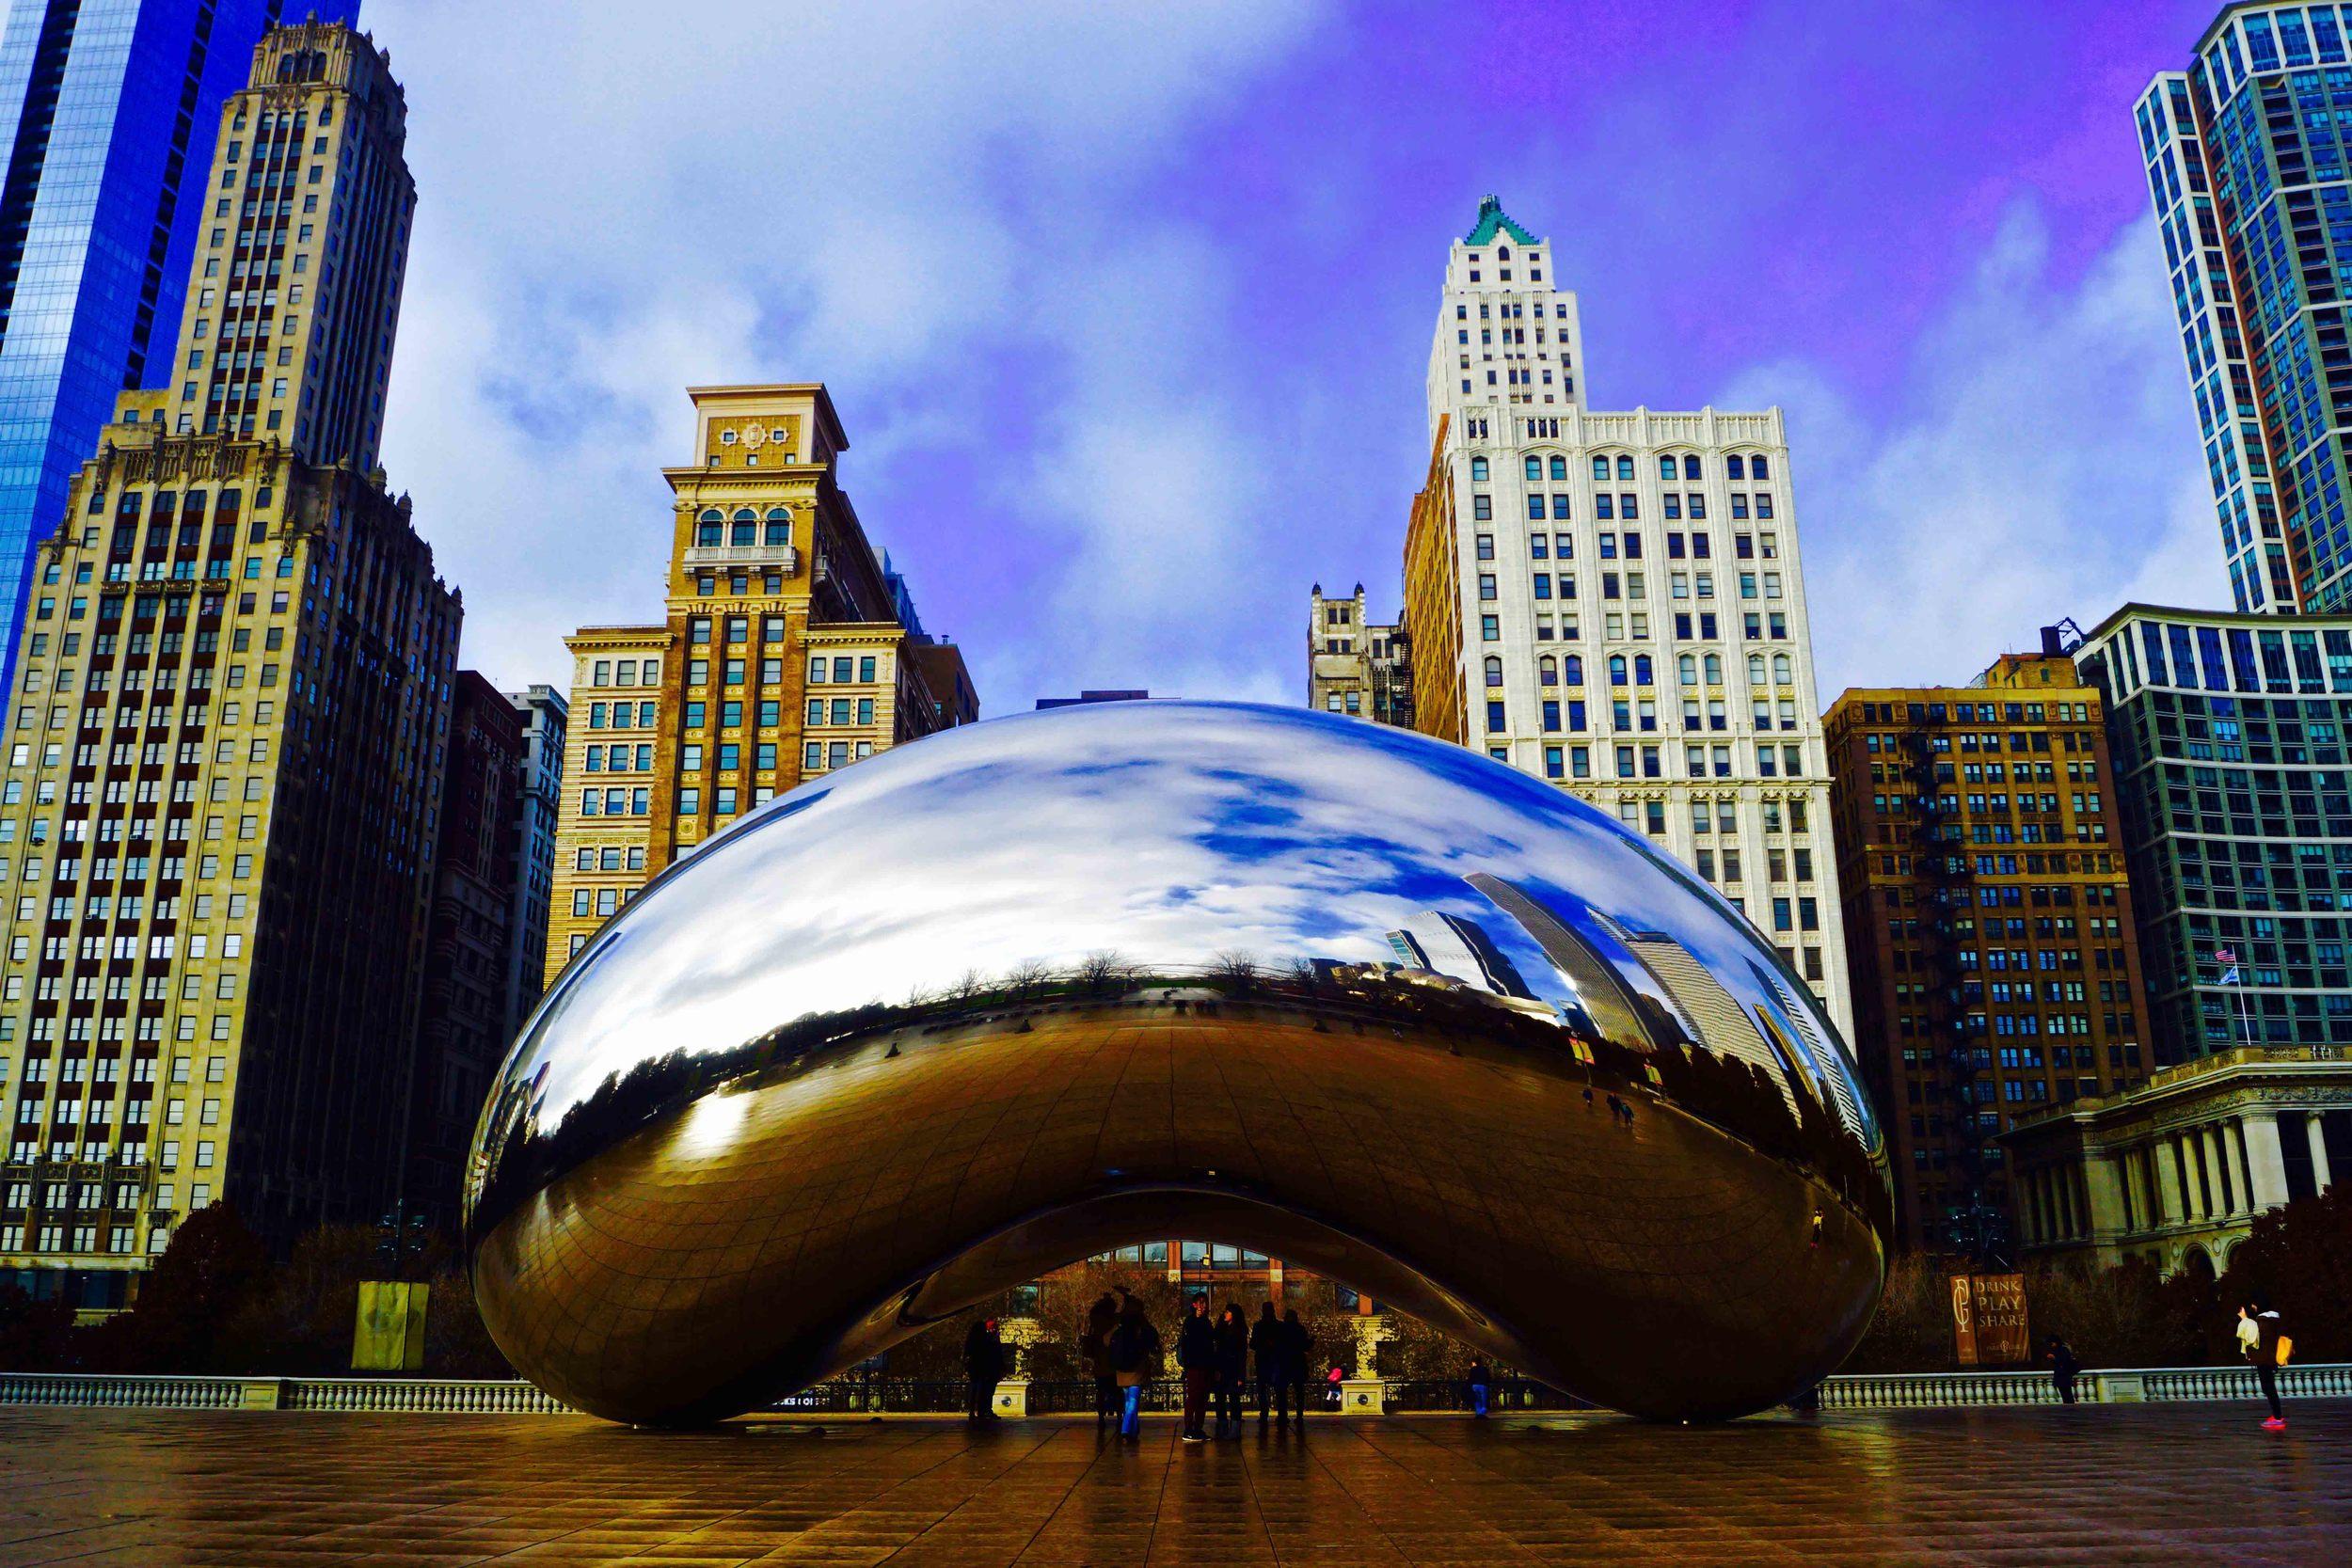 Millennium Park, Chicago, November 2014